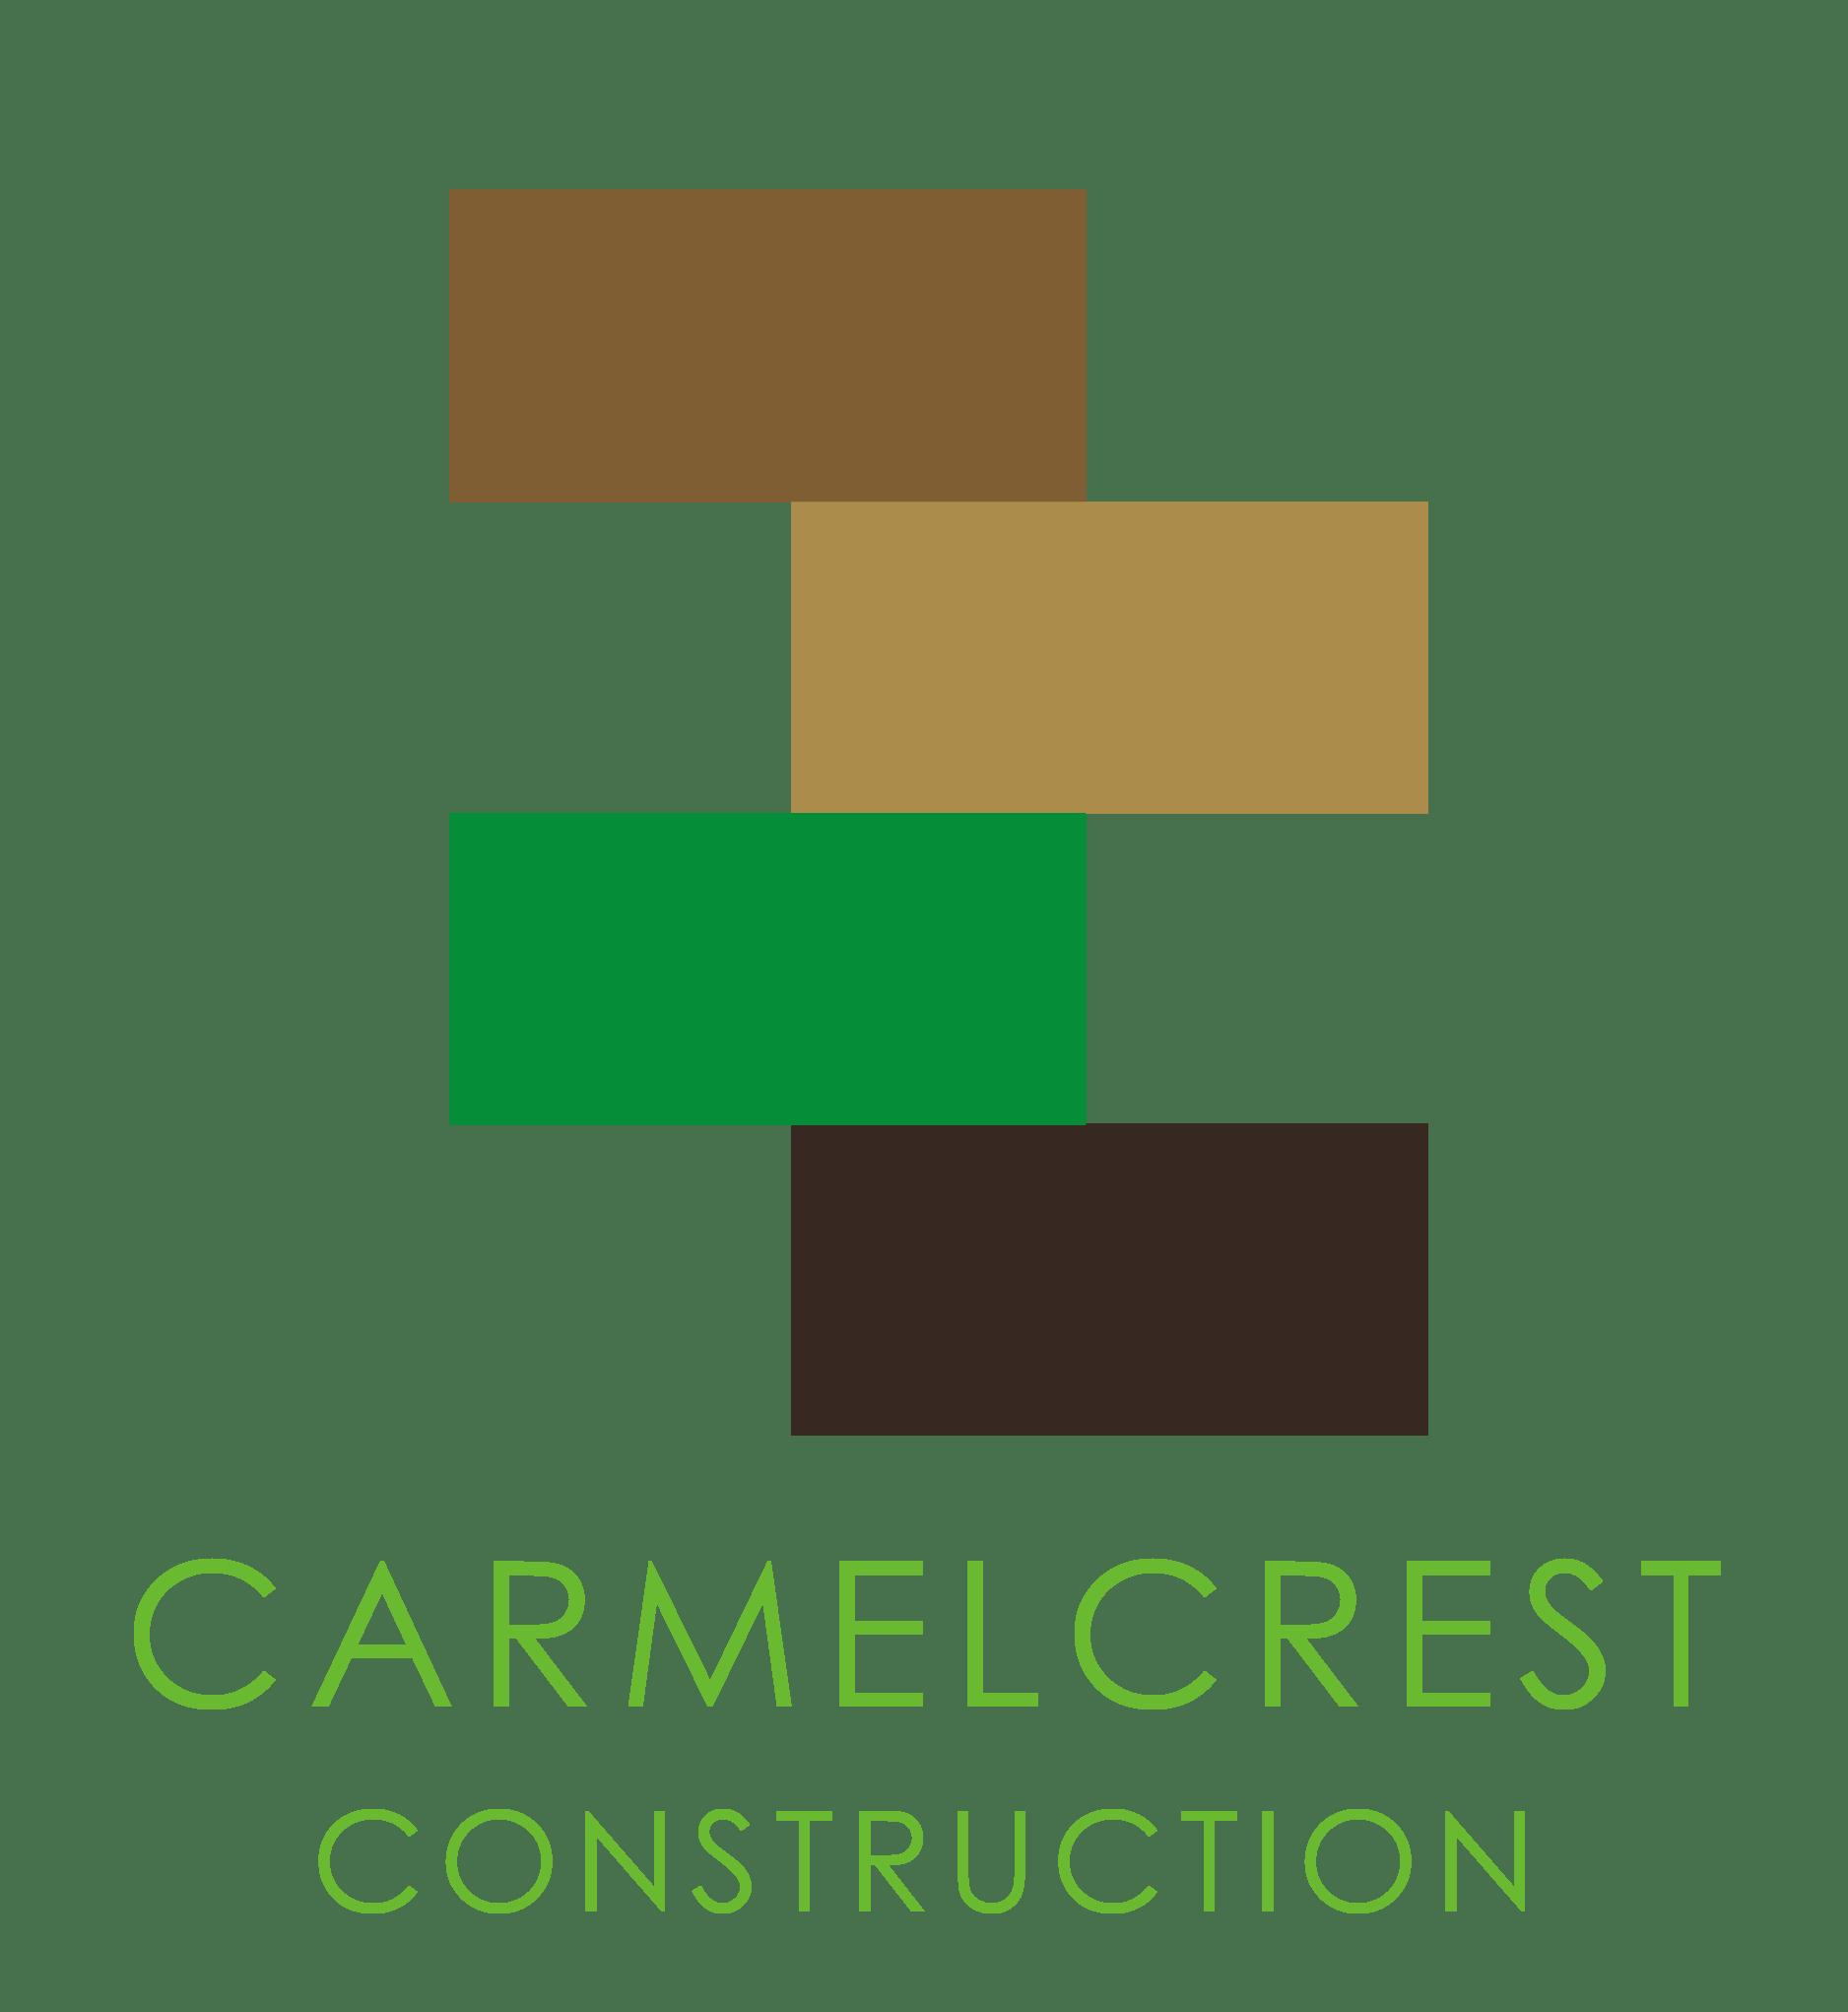 Carmelcrest Construction Logo LARGE